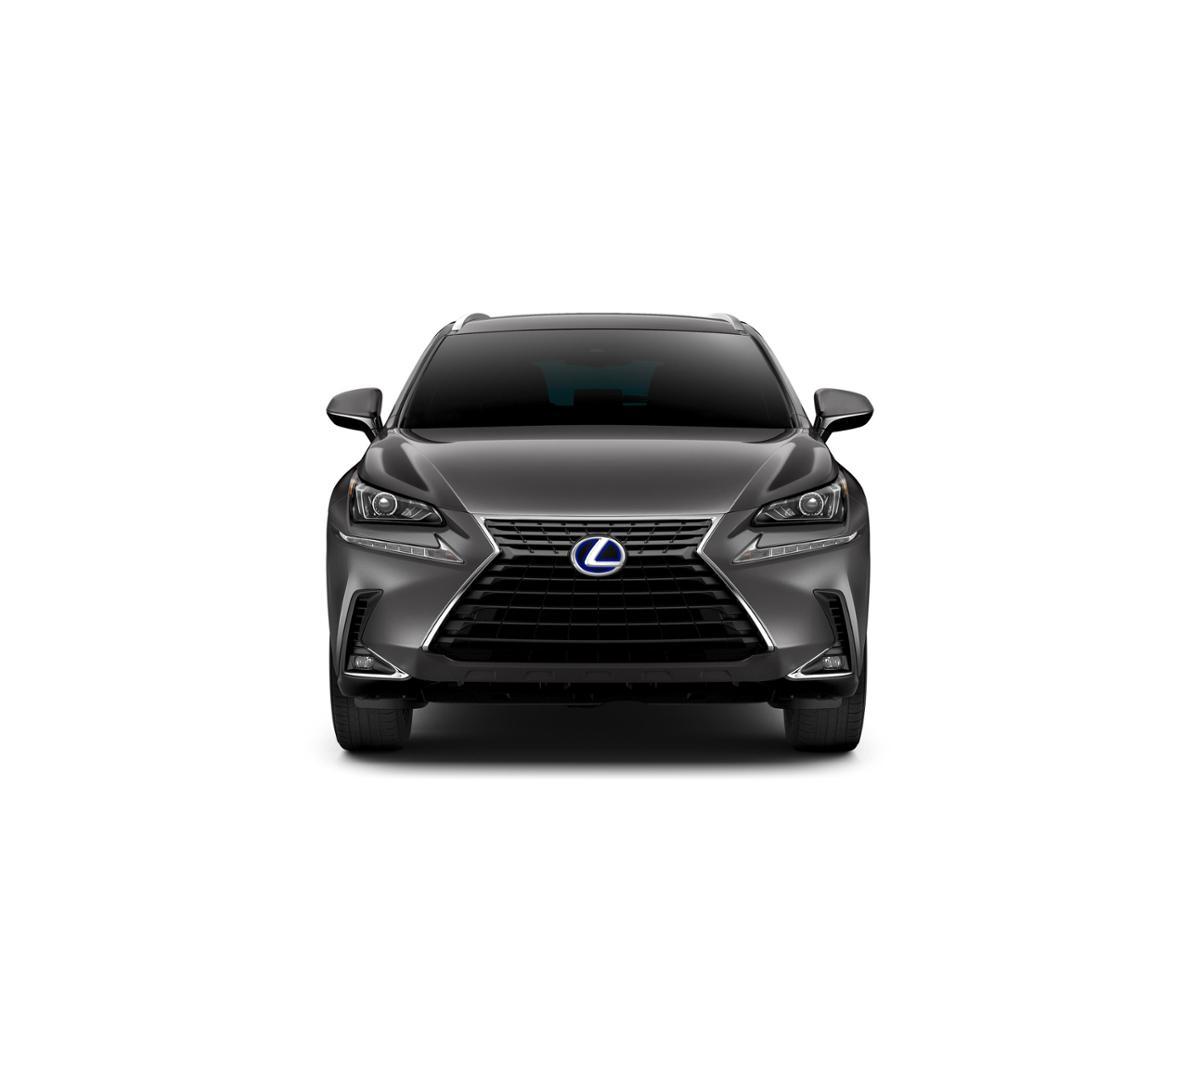 Lexus Nx300h Price: Brentwood Nebula Gray Pearl 2019 Lexus NX 300h: New Suv